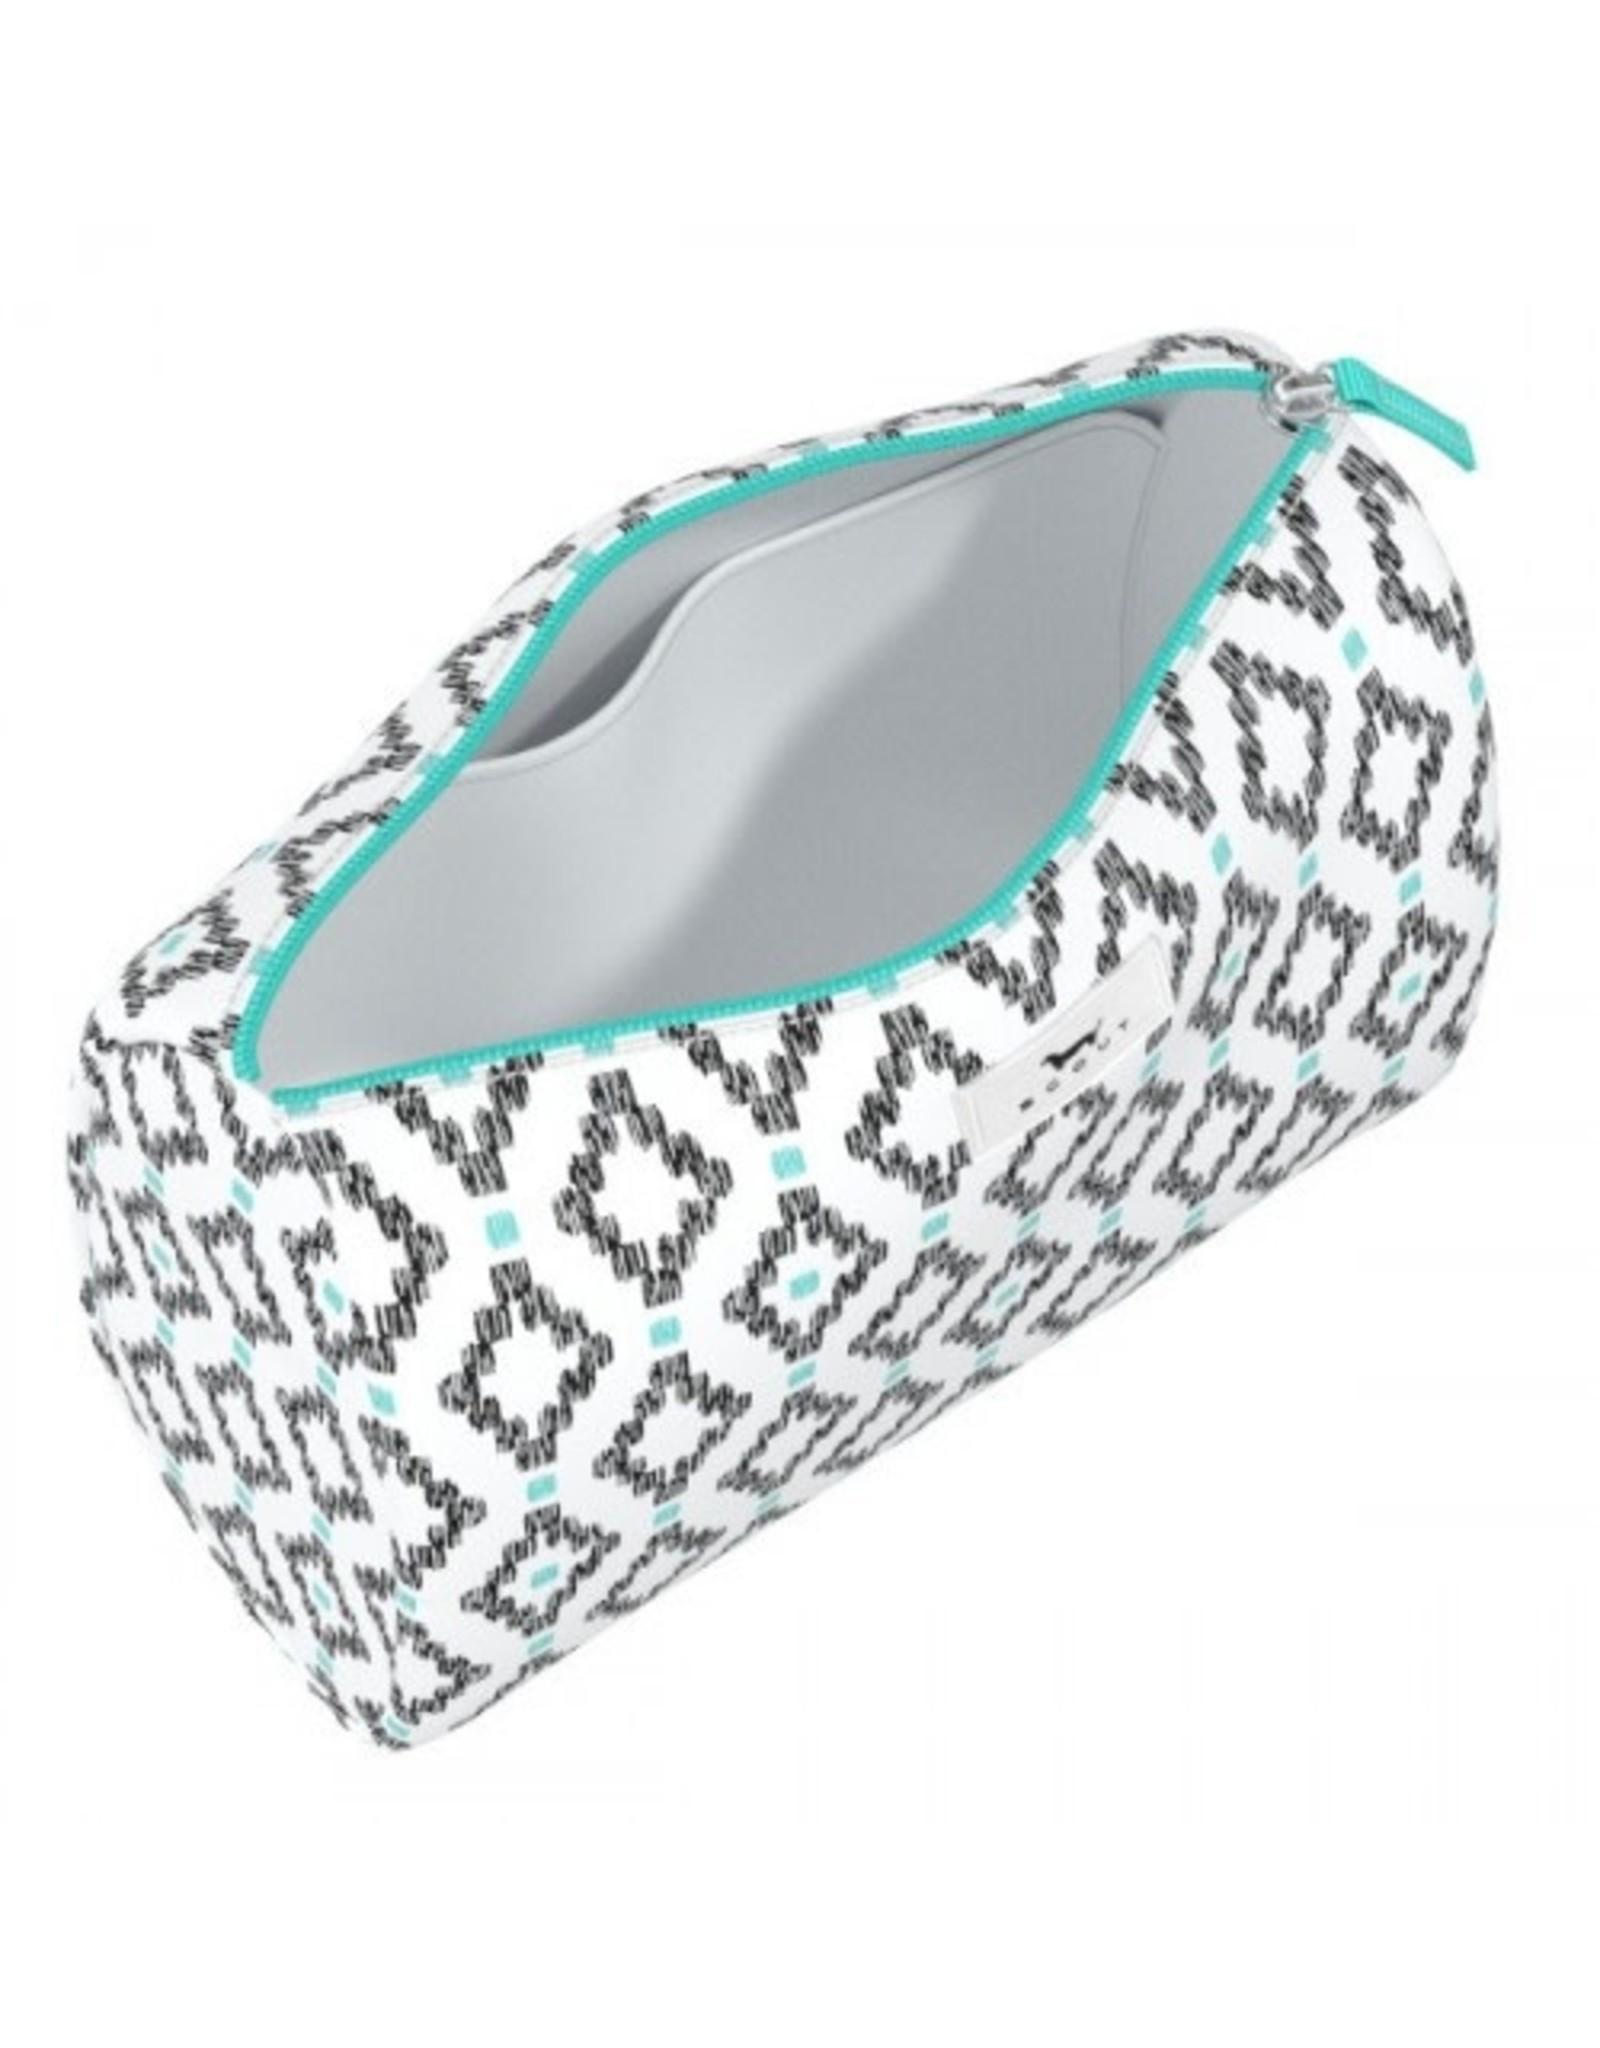 Packin' Heat / Teal Diamond